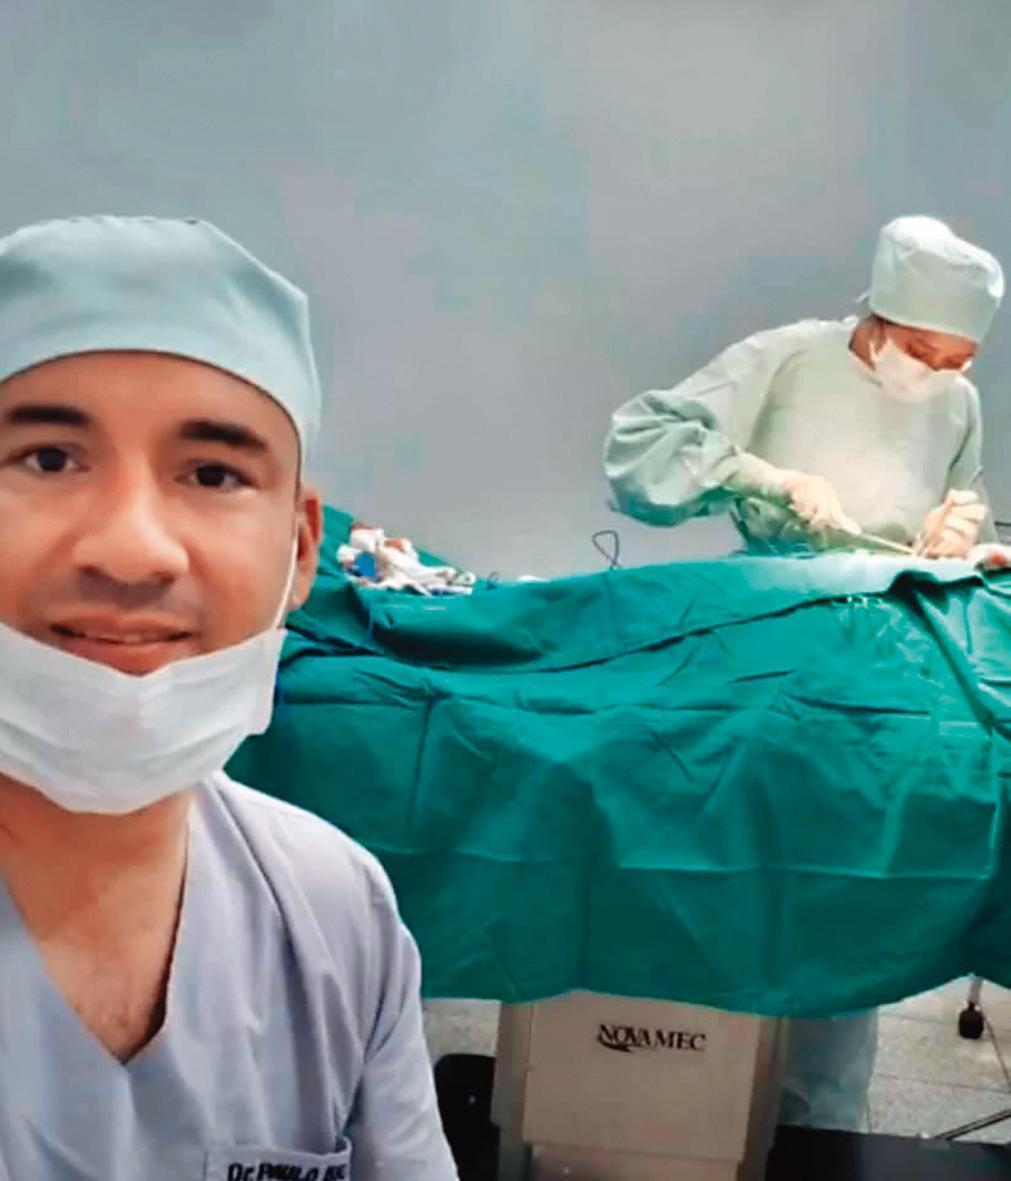 Liz老公(左)是技術高強的外科醫師,在醫學方面幫助Liz(右)很多。(翻攝自Li Yu Yang-Emy臉書)